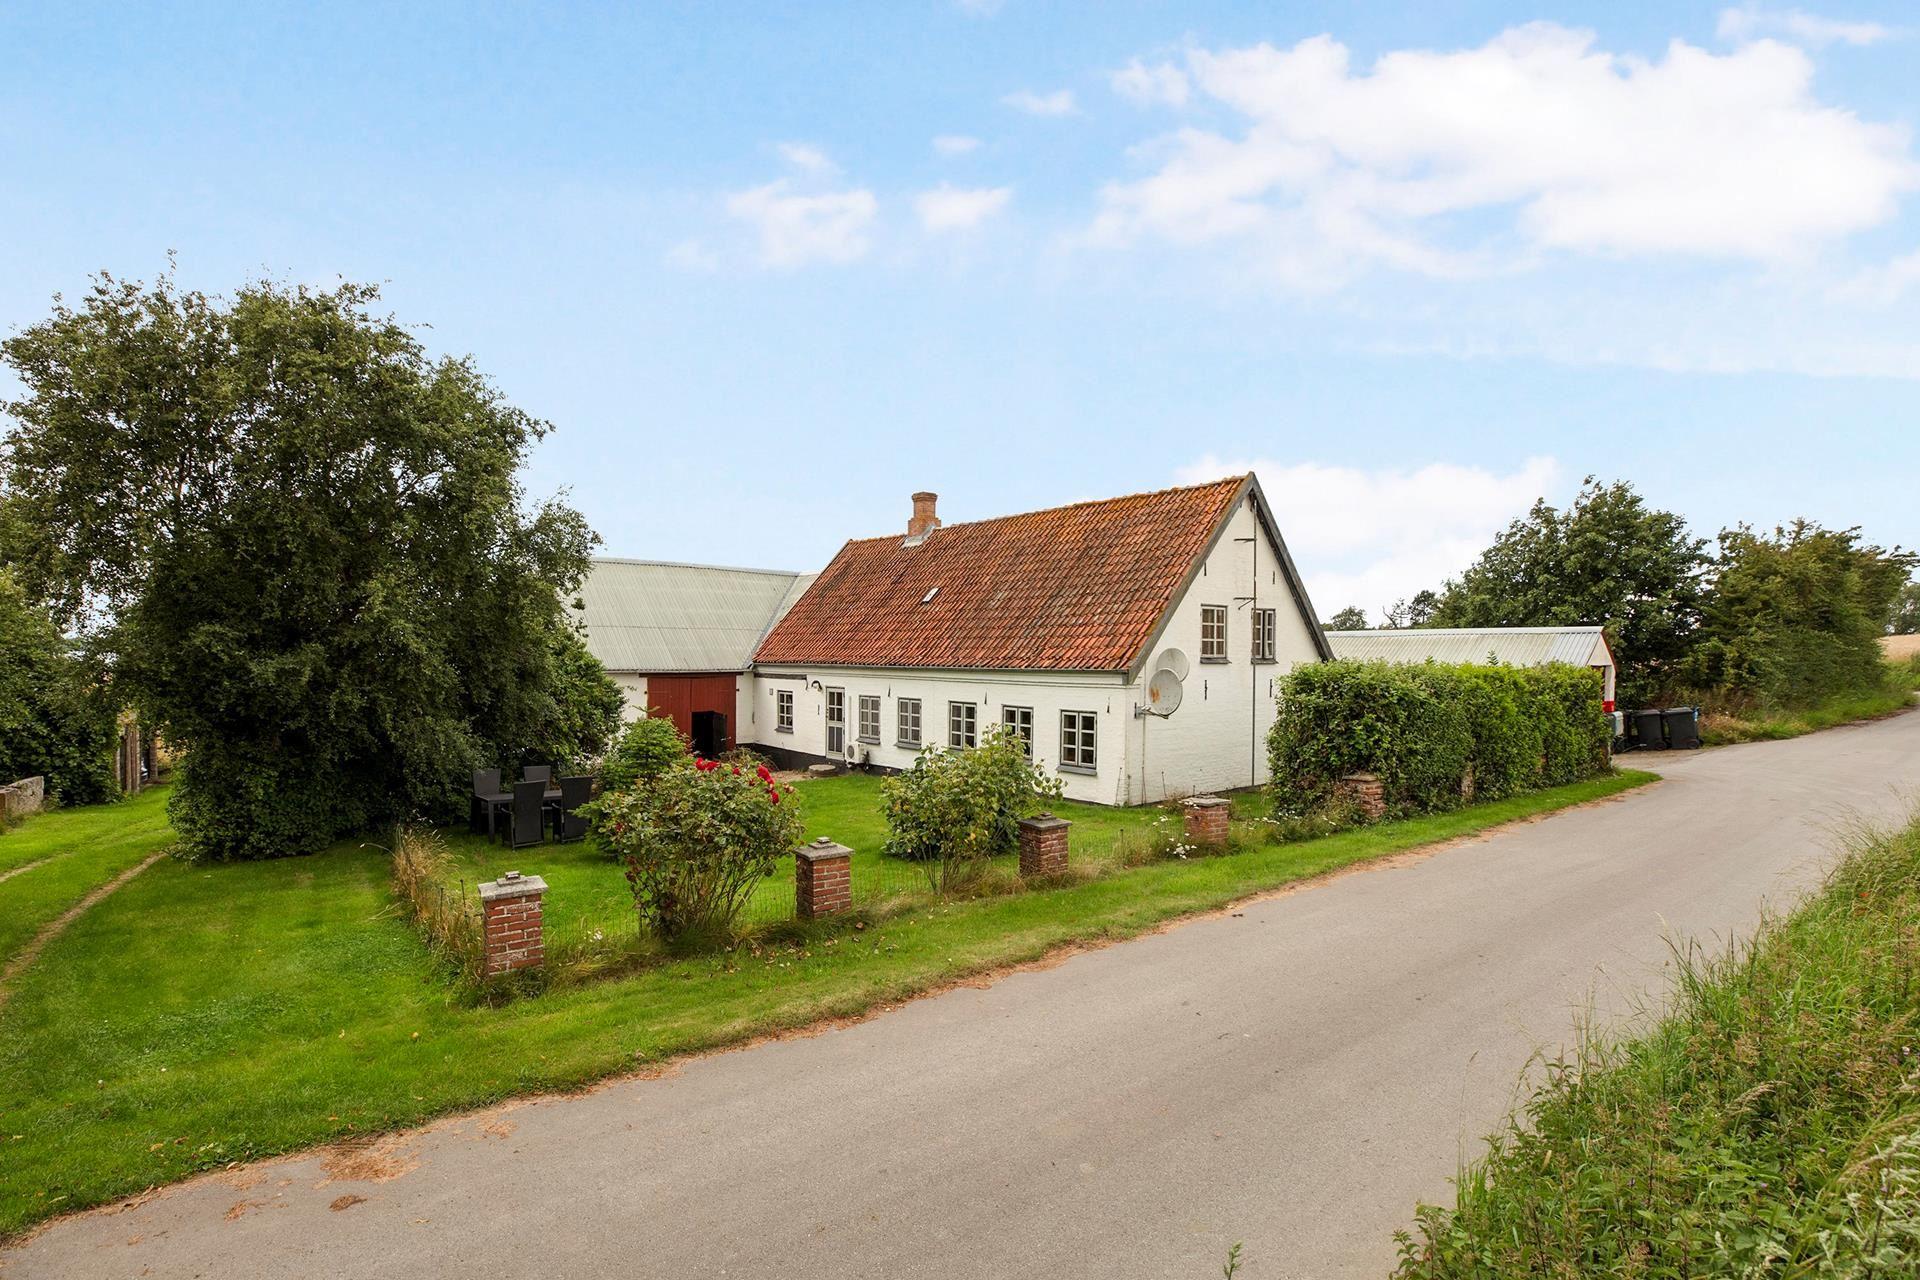 Lyngevej 6, Mjels Mark, 6430 Nordborg